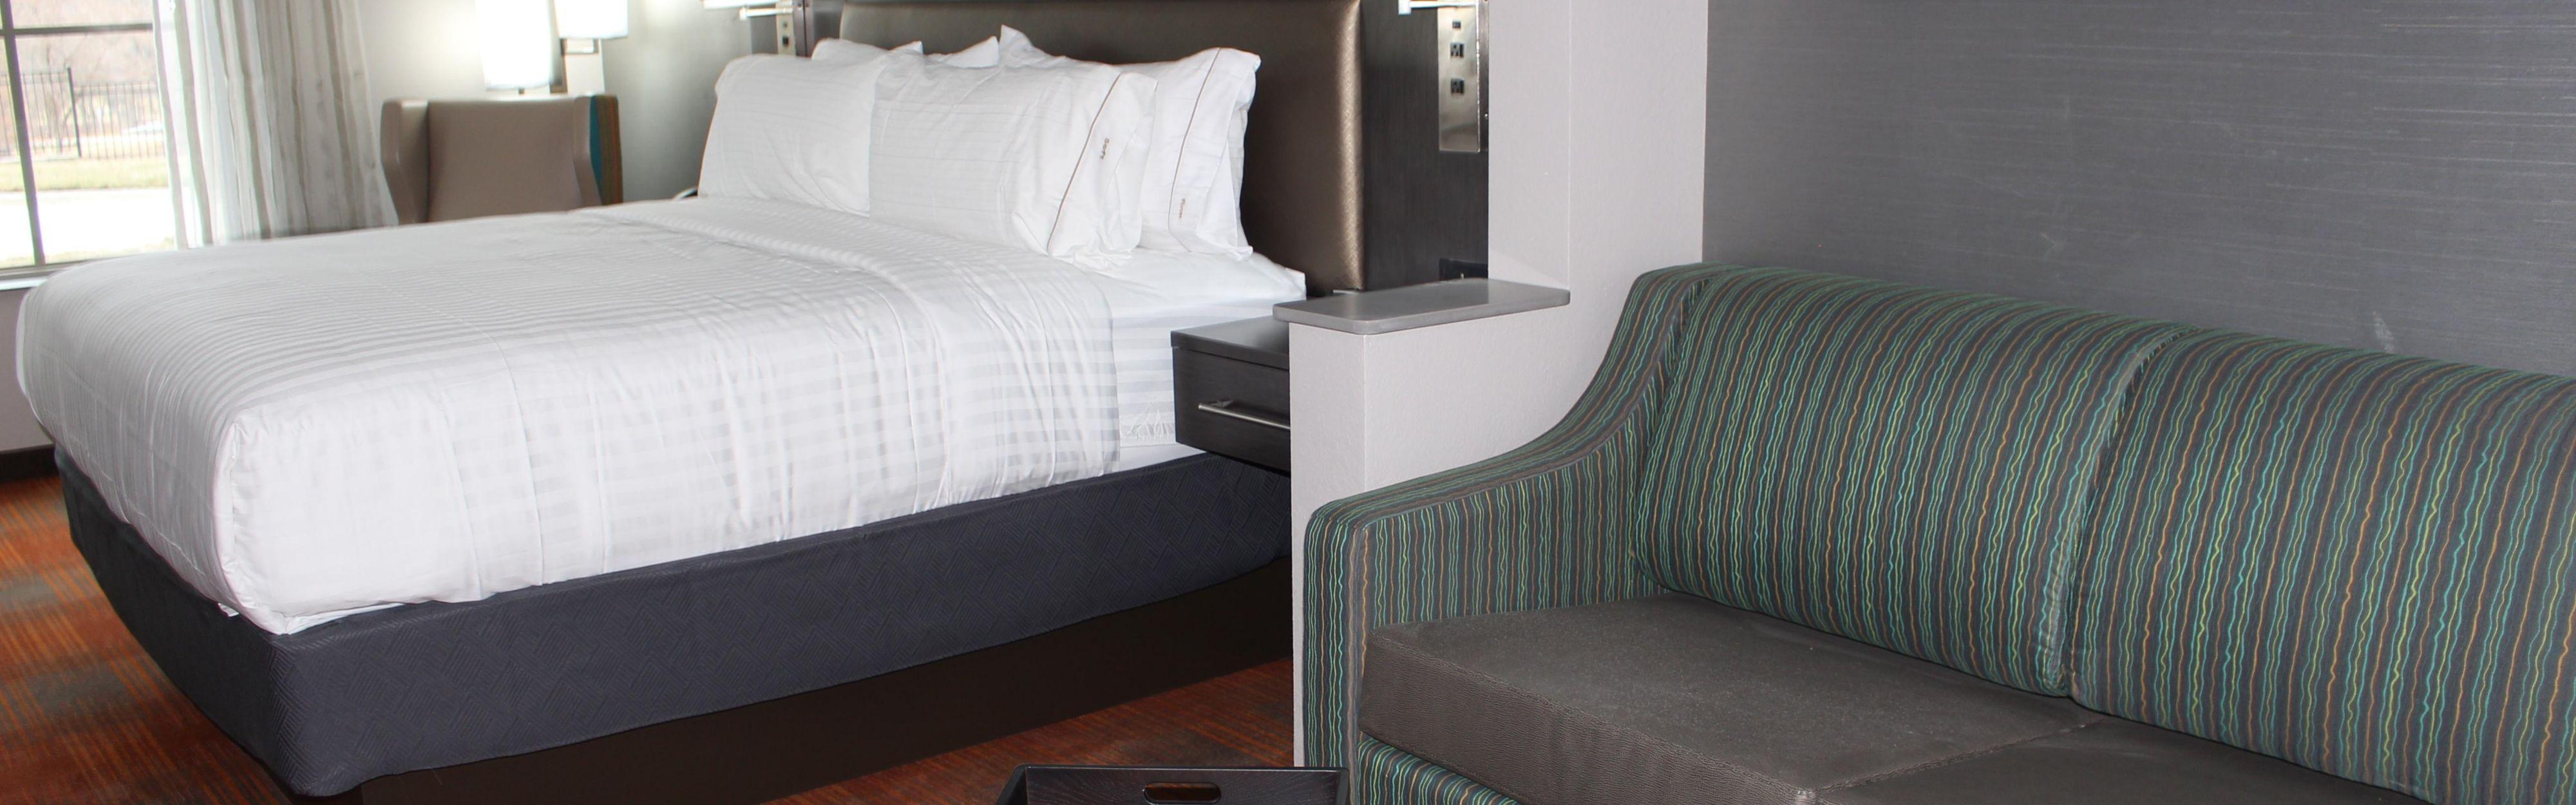 Holiday Inn Express & Suites Shawnee-Kansas City West image 1